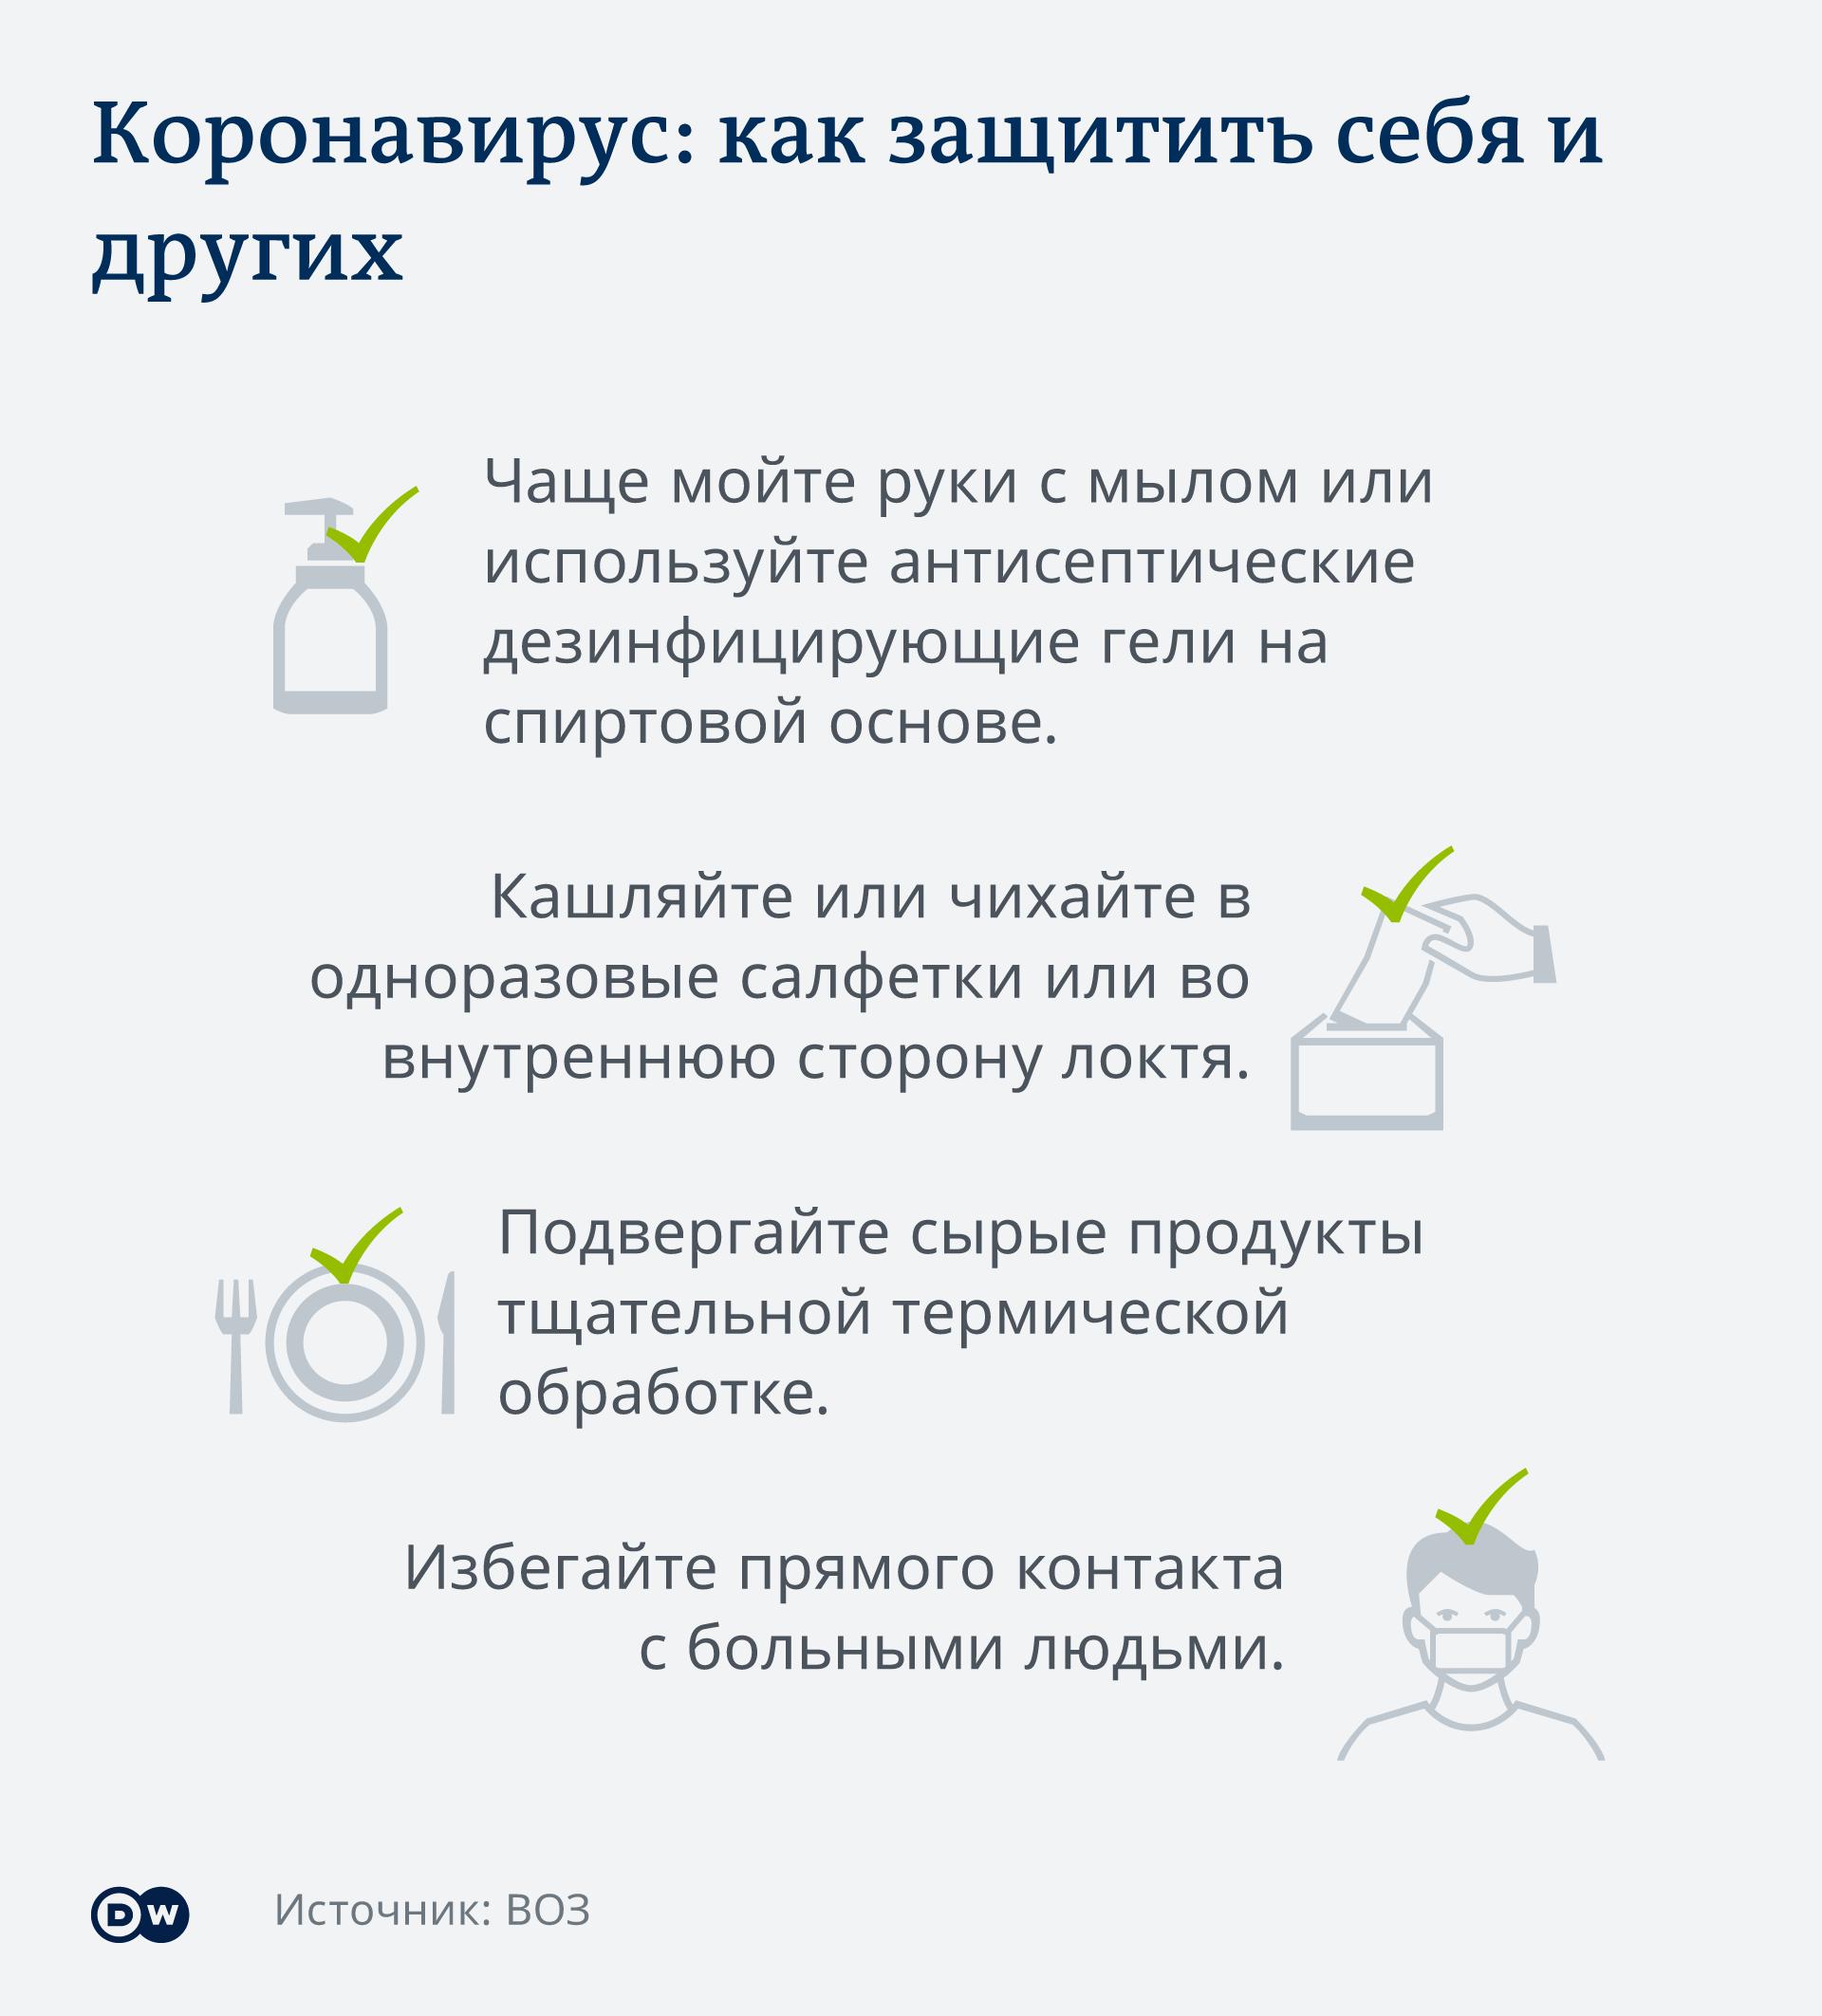 Infografik Coronavirus: Ways to protect yourself and others RU